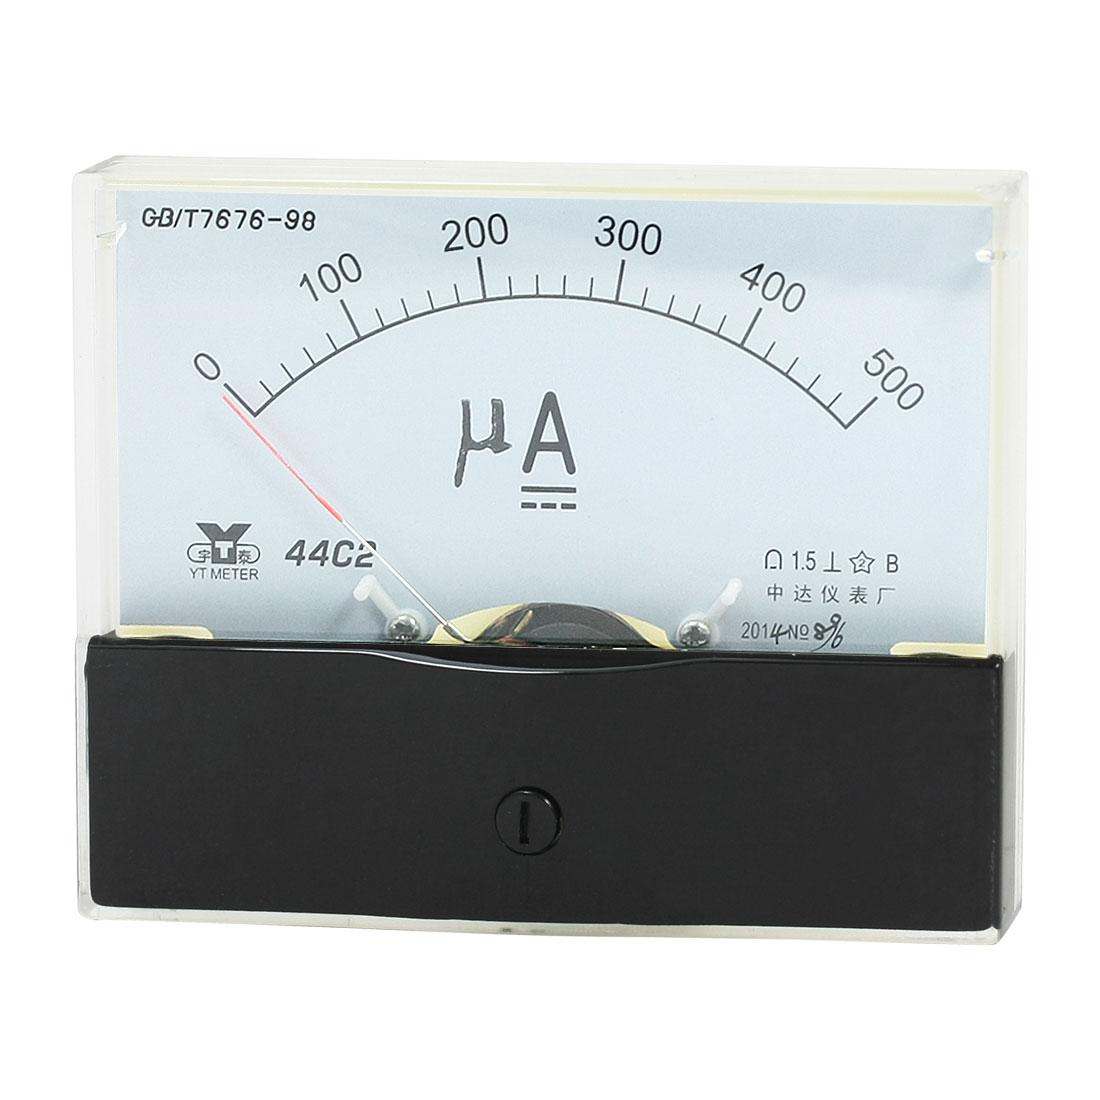 Rectangle Measurement Tool Analog Panel Ammeter Gauge DC 0 - 500uA Measuring Range 44C2